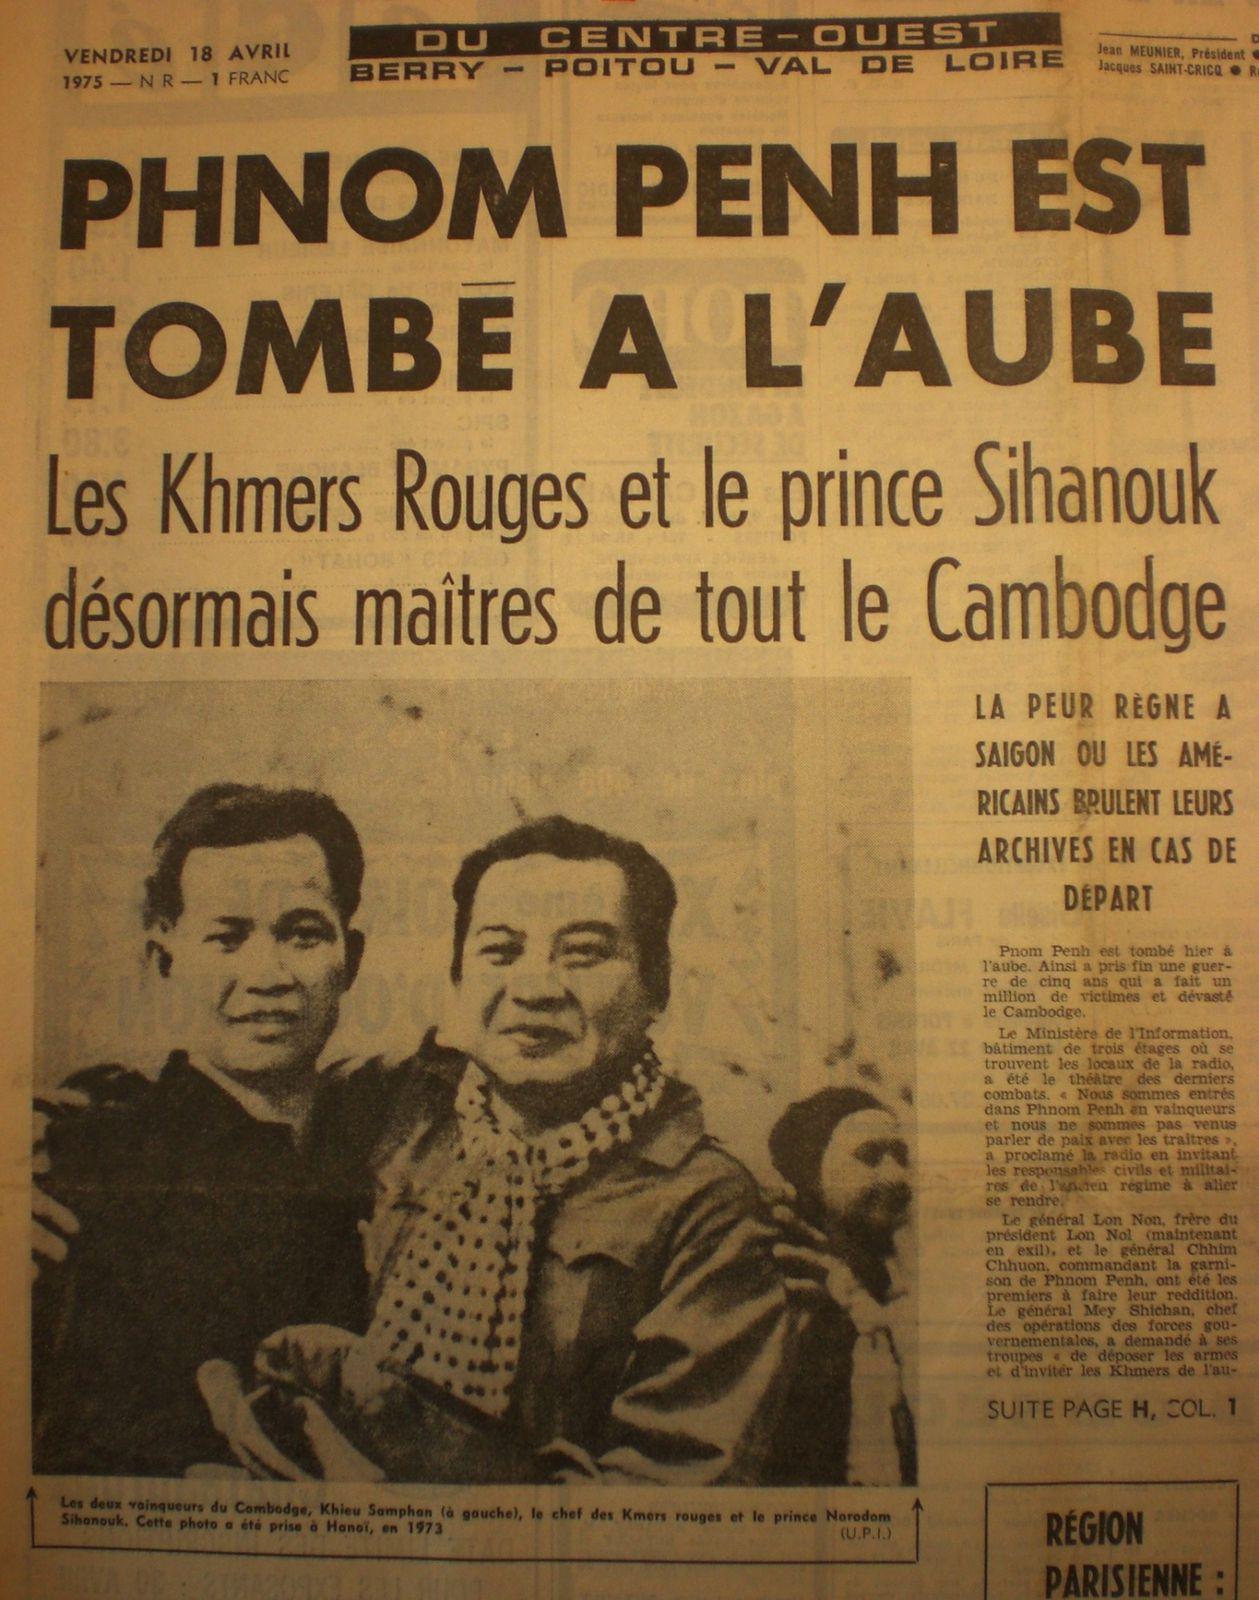 Phnom-Penh-est-tombee.JPG